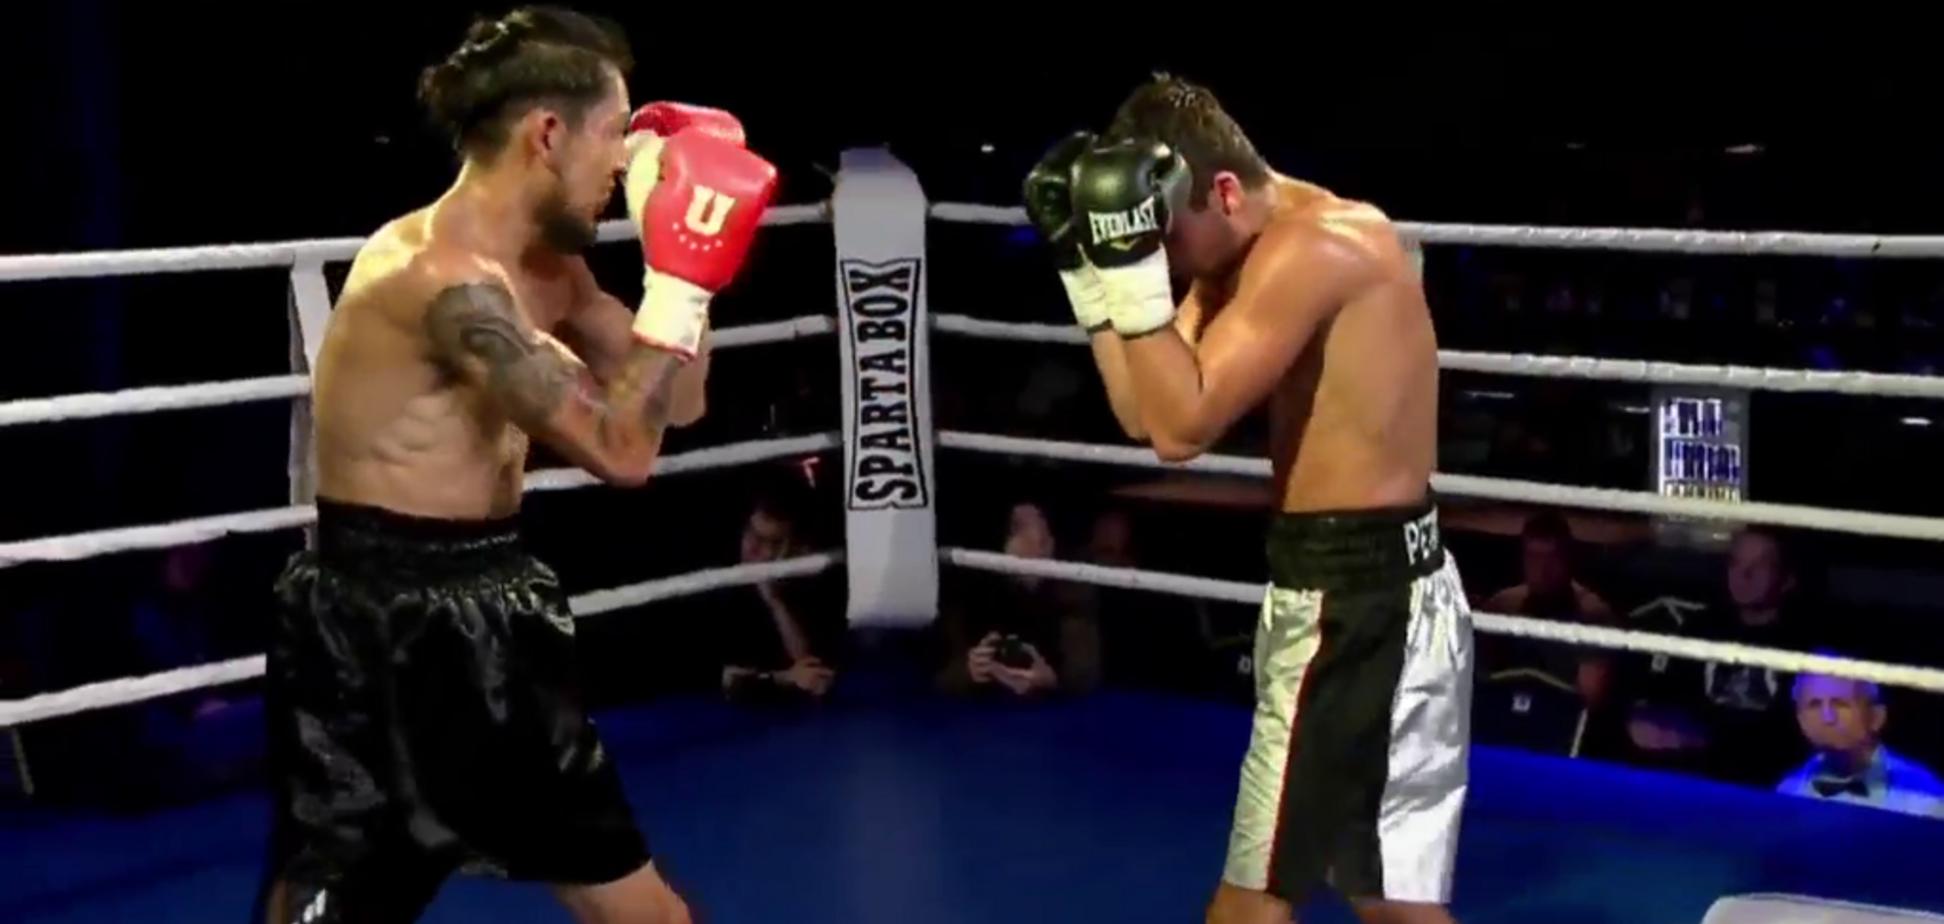 Украинский боксер пушечными ударами сломал ребро мексиканцу - видео нокаута